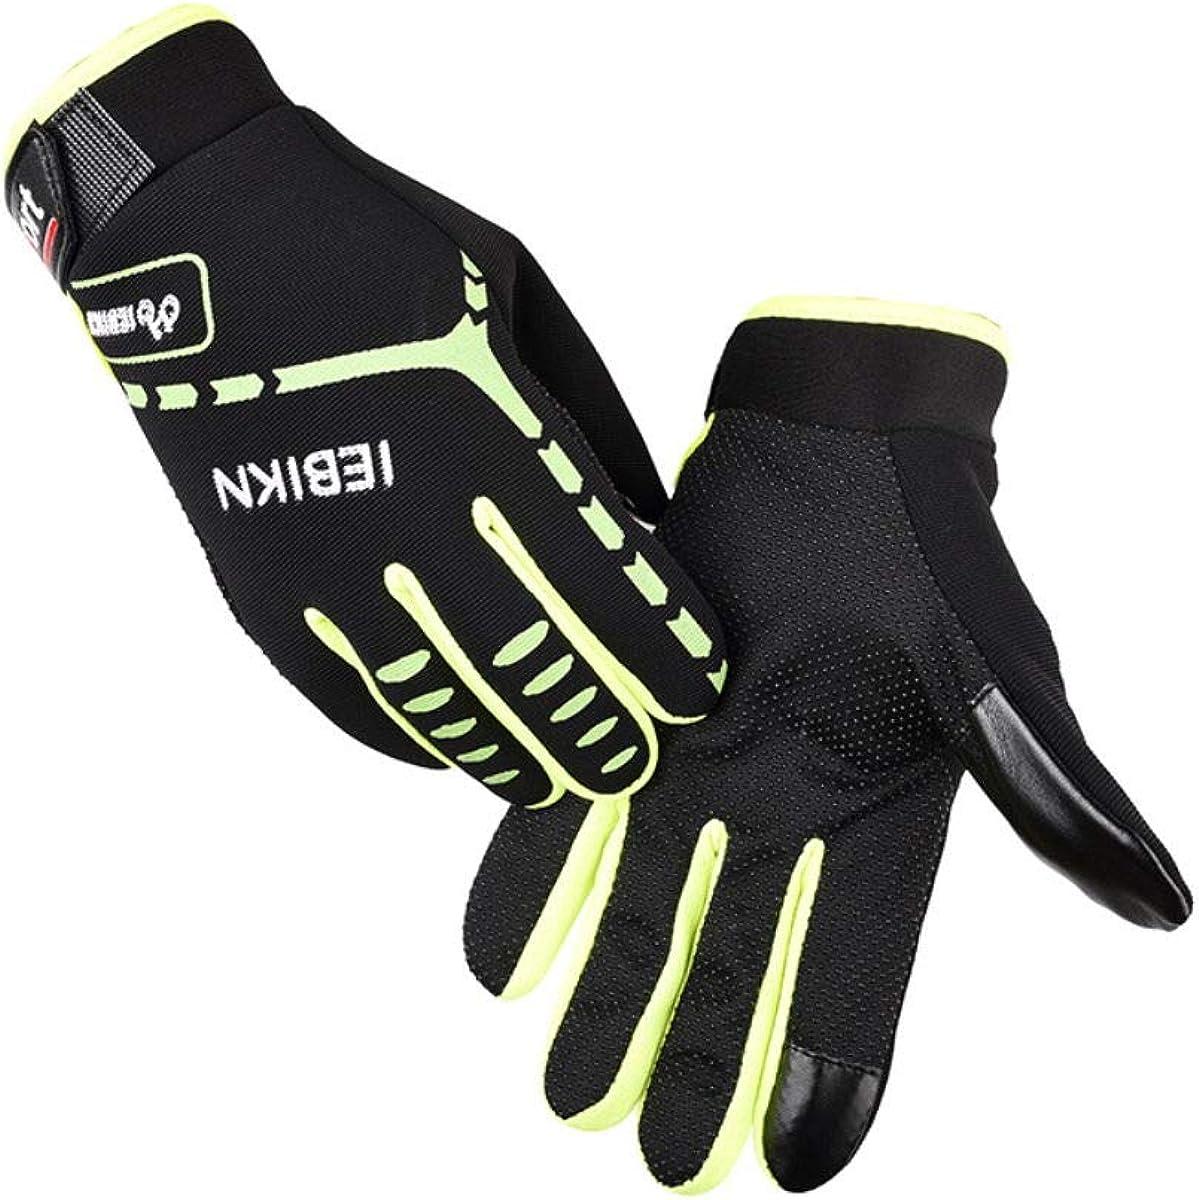 Motor Cycling Gloves Biking Gloves Mountain Bike MTB Bicycle Dirt Bike Gloves Full Finger Anti-Slip Shock-Absorbing Workout Gloves for Men Women